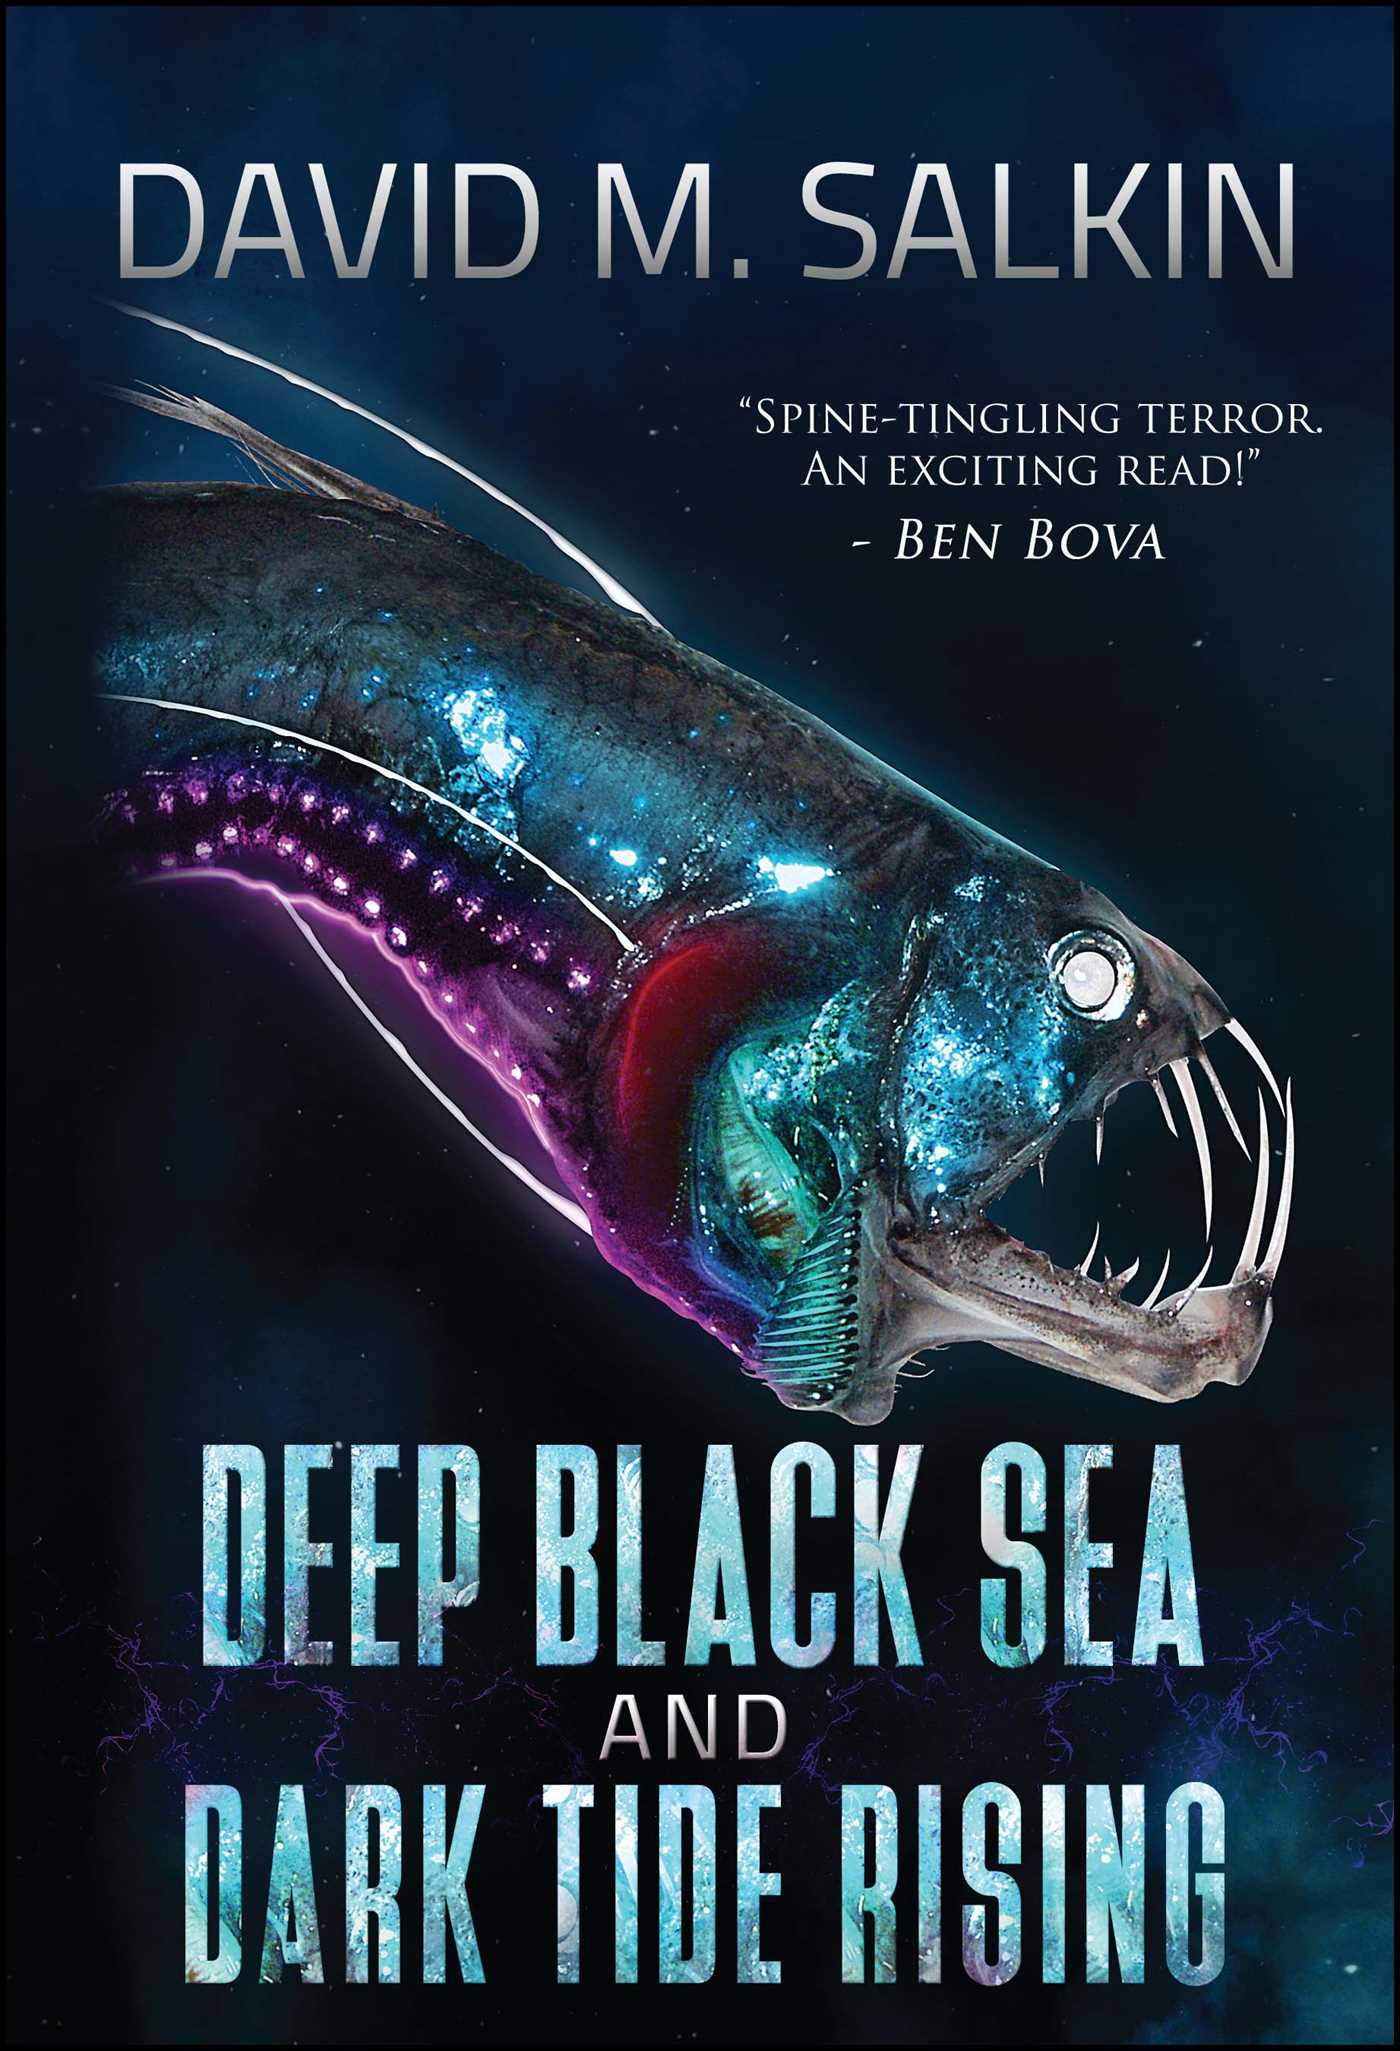 Deep black sea and dark tide rising 9781682614471 hr